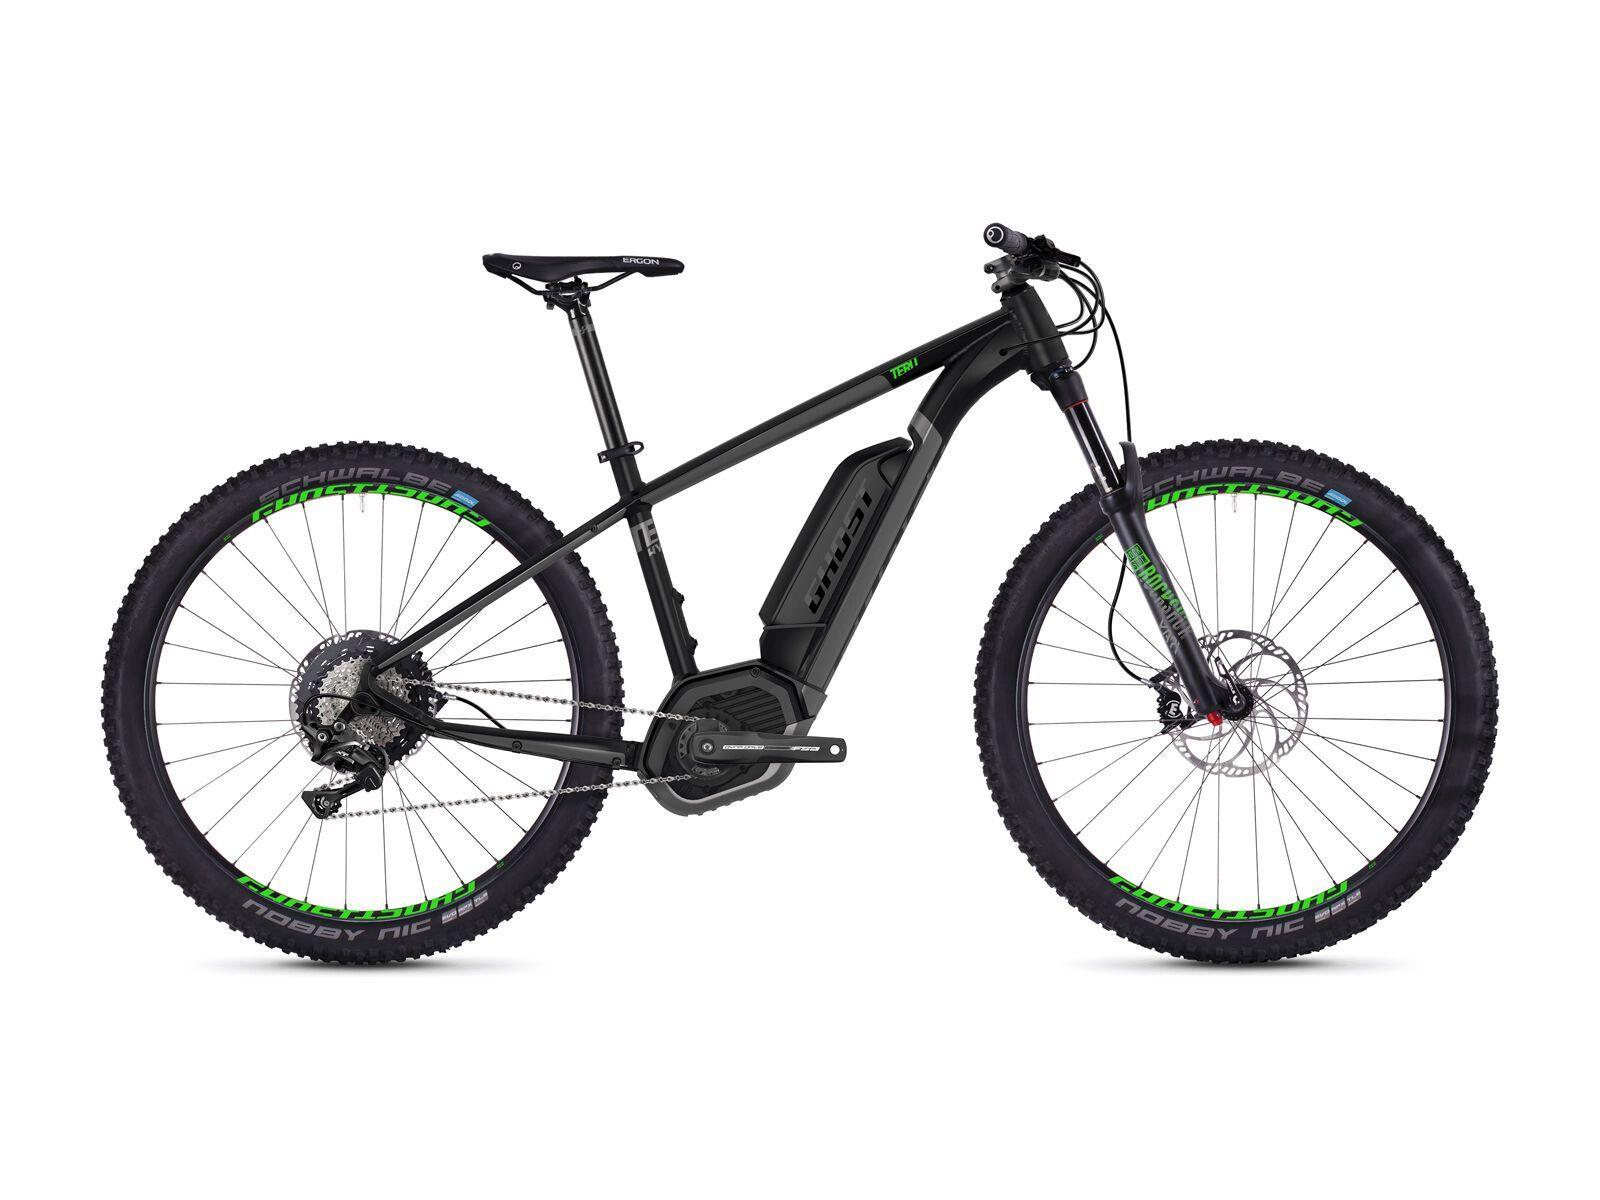 Ghost Hybride Teru B7.7+ AL, black/gray/neon green   Bild 1